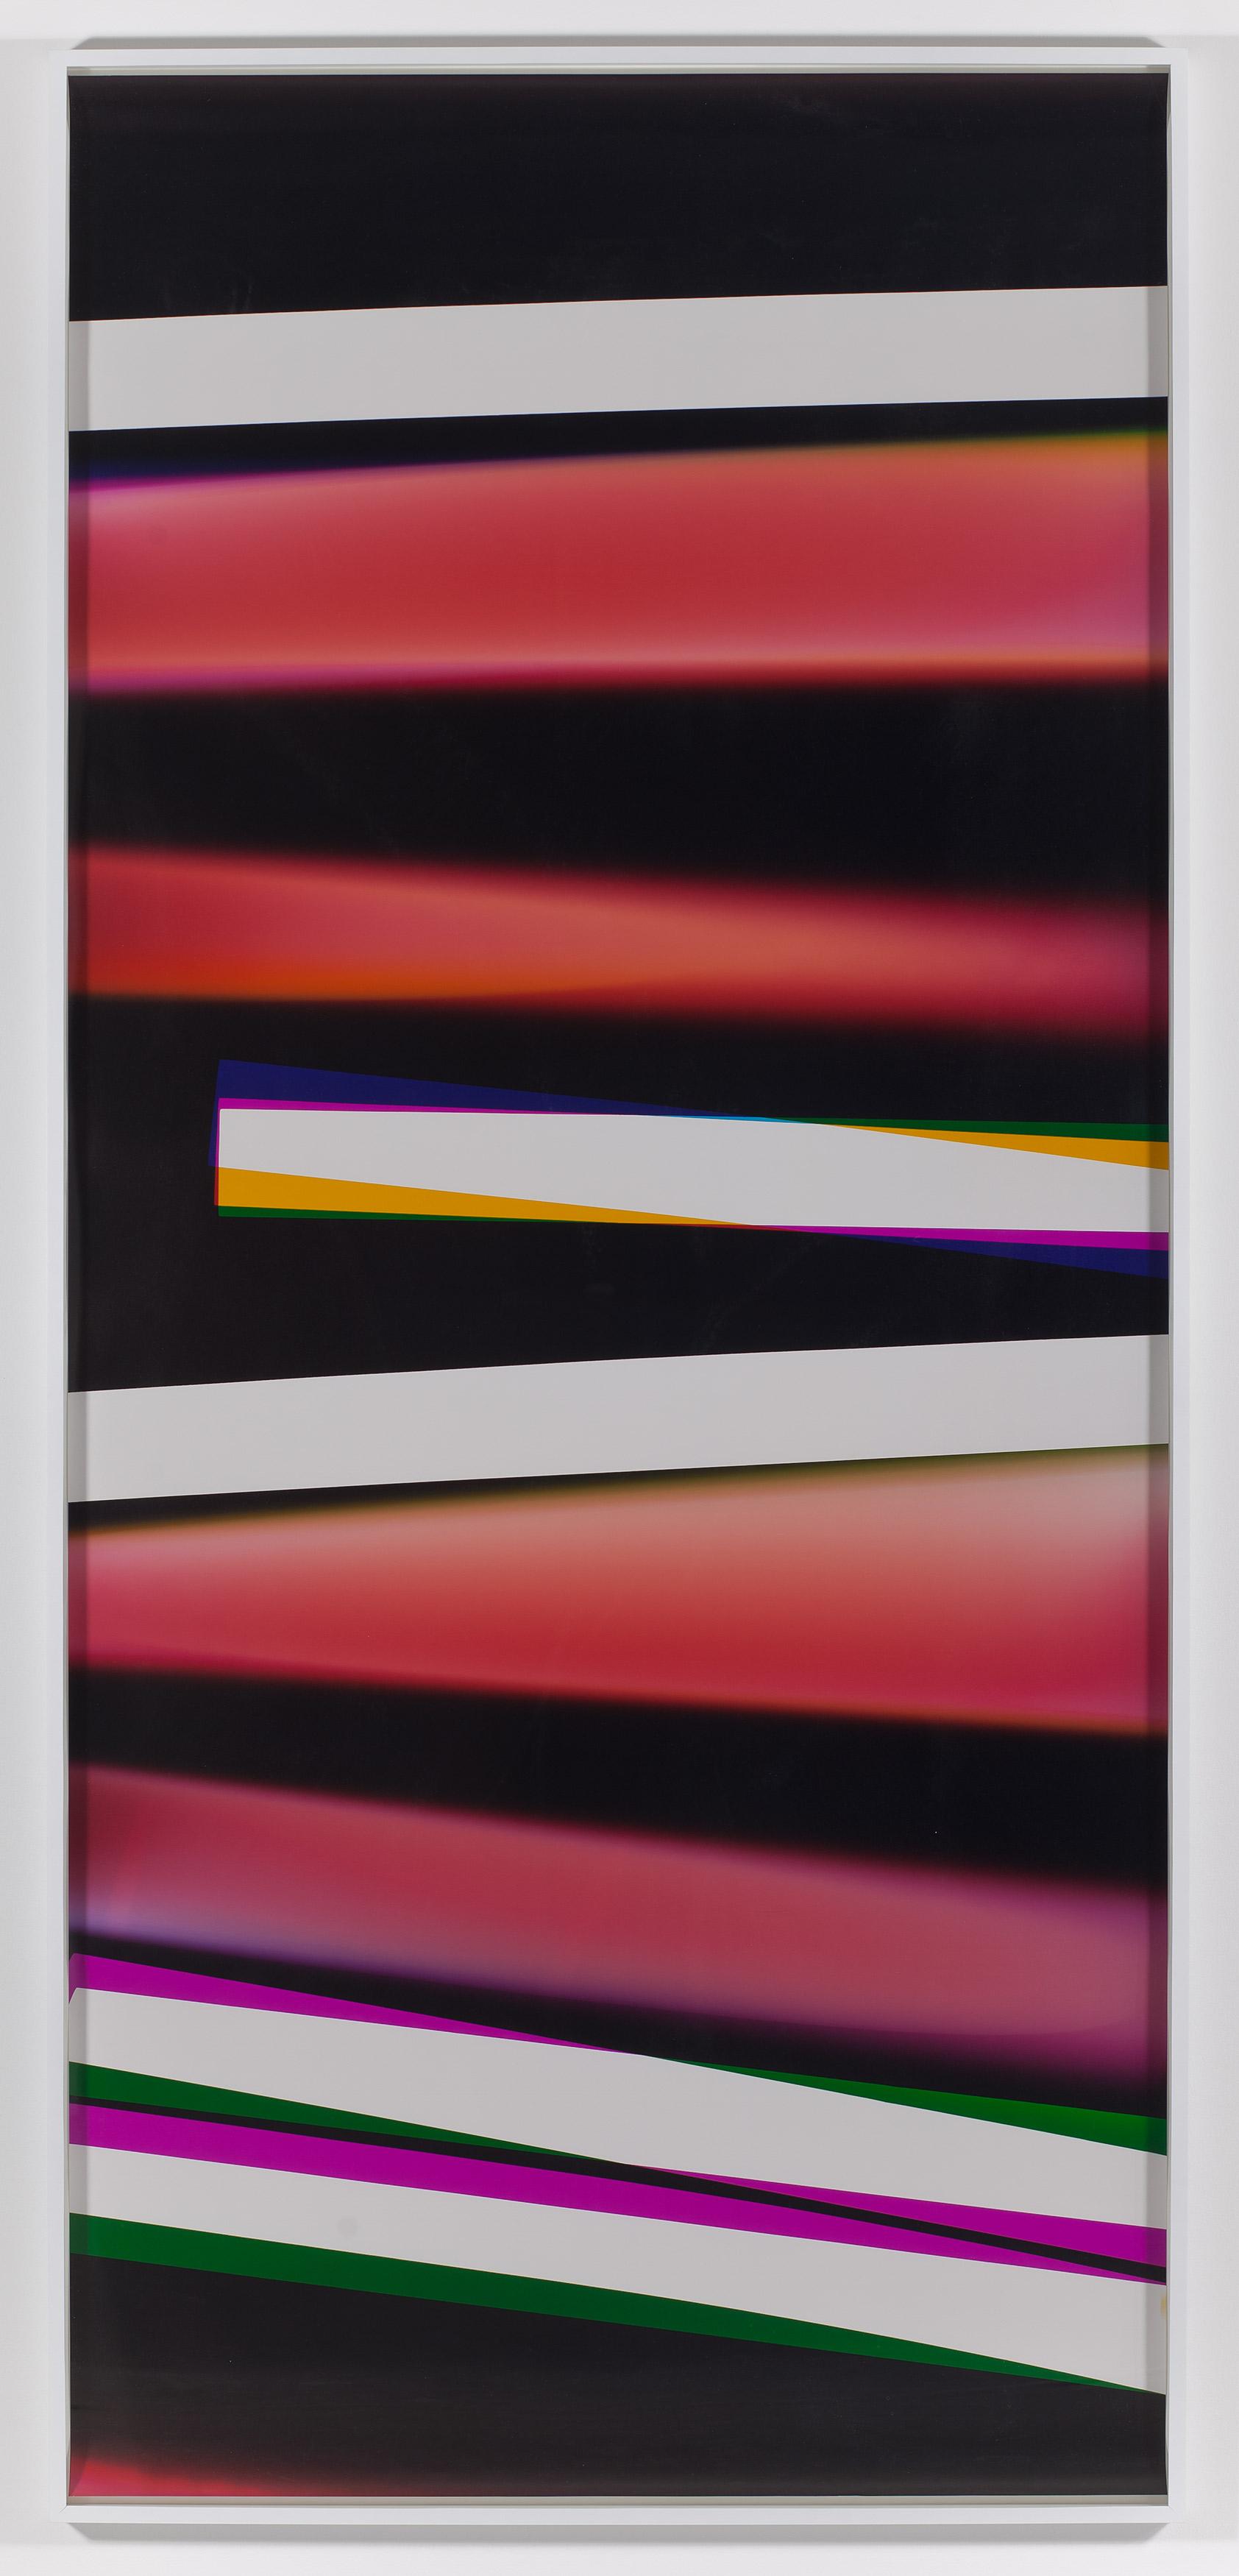 Black Curl (CMY/Five Magnet: Irvine, California, March 26,2010, Fujicolor Crystal Archive Super Type C, Em. No. 165-021, 06310)   2011  Color photographic paper  50 x 111 inches   Black Curls, 2010–2013    PROCESSCOLORFIELDS, 2011